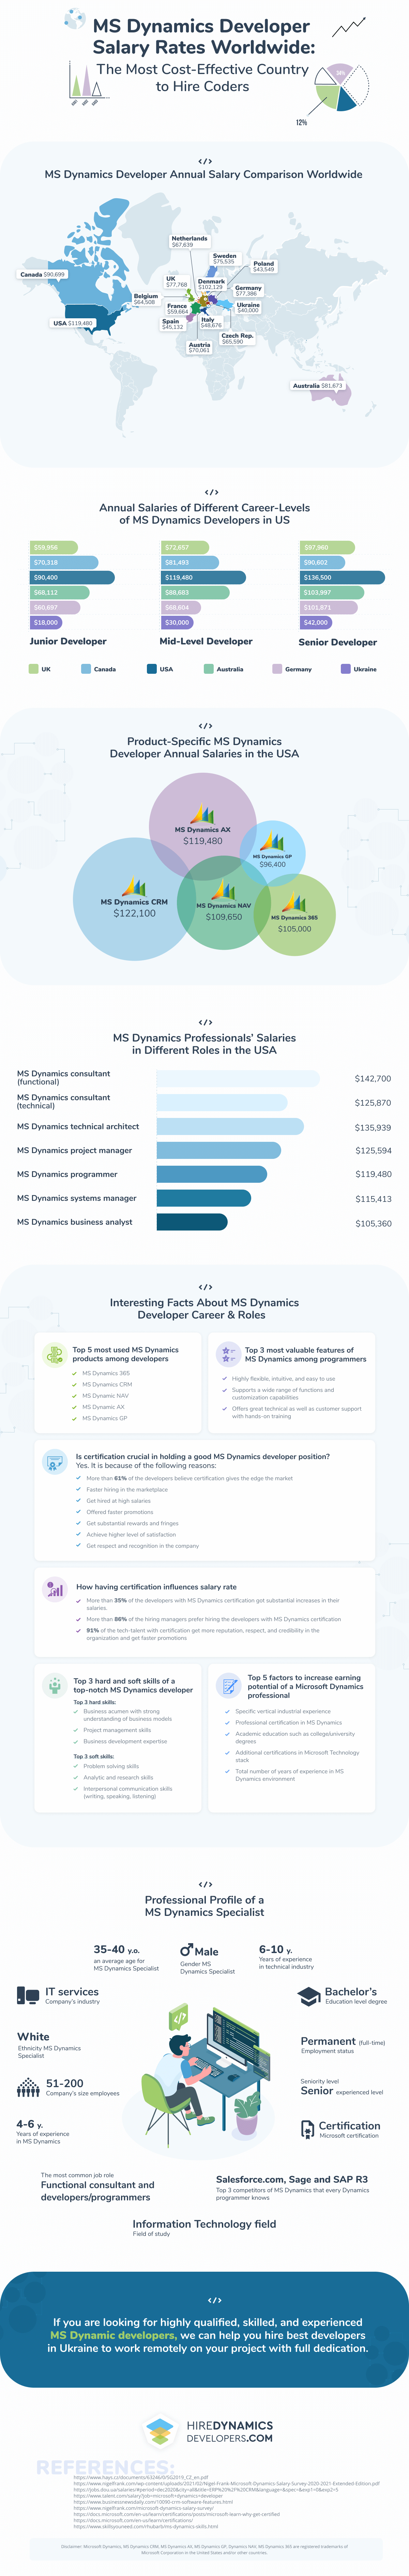 ms dynamics developer salary rates worldwide